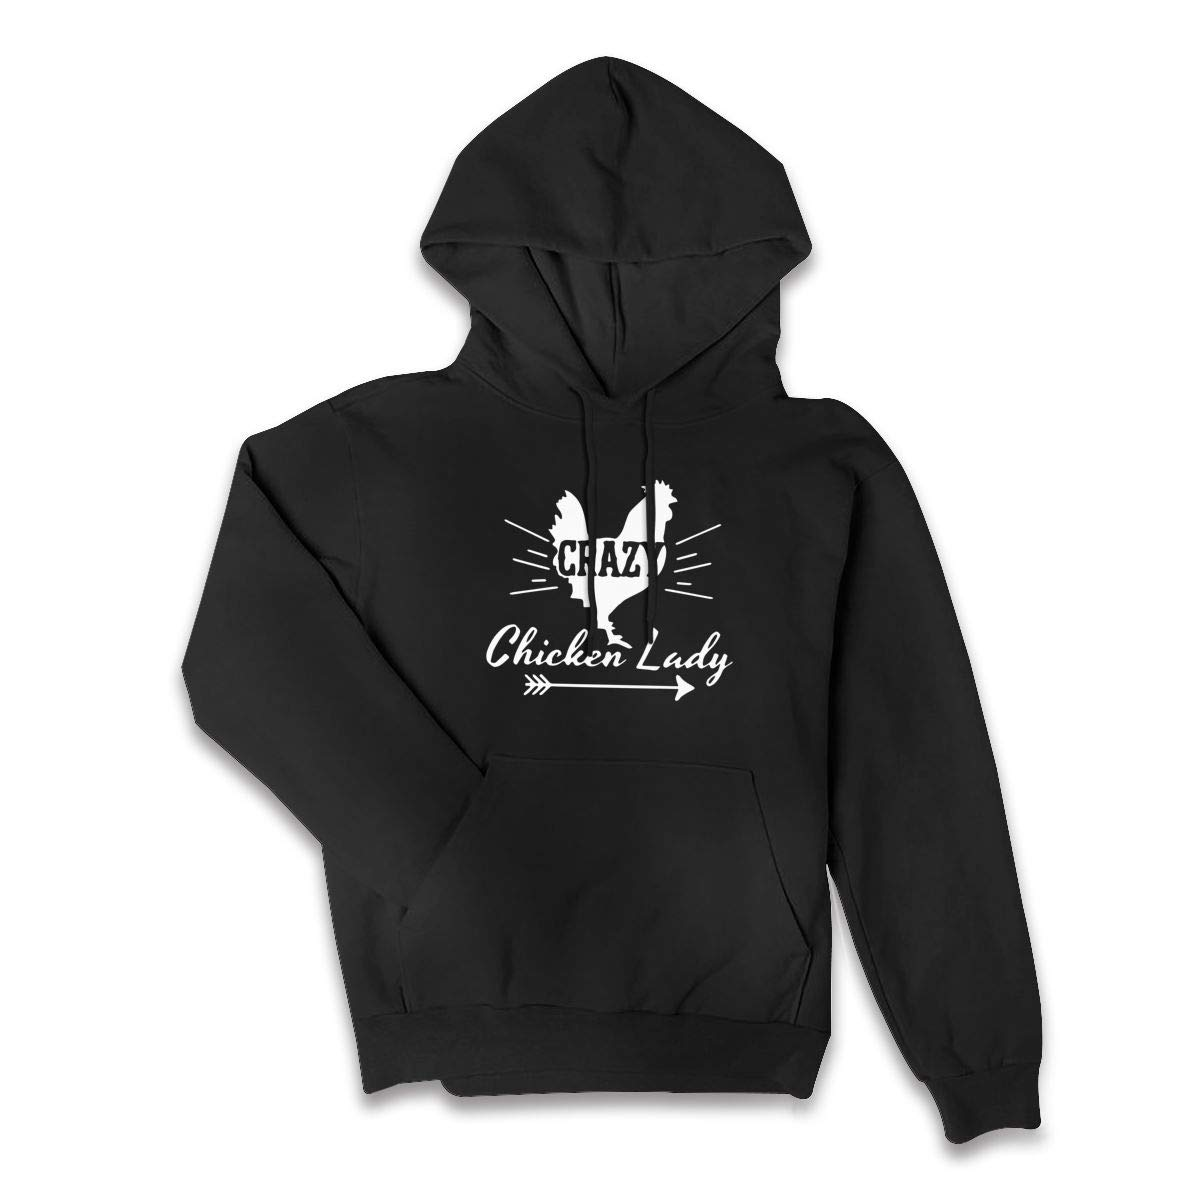 Lponvx Crazy Chicken Lady Logo Womens Pocket Long Sleeve Hooded Sweatshirt with Plus Size